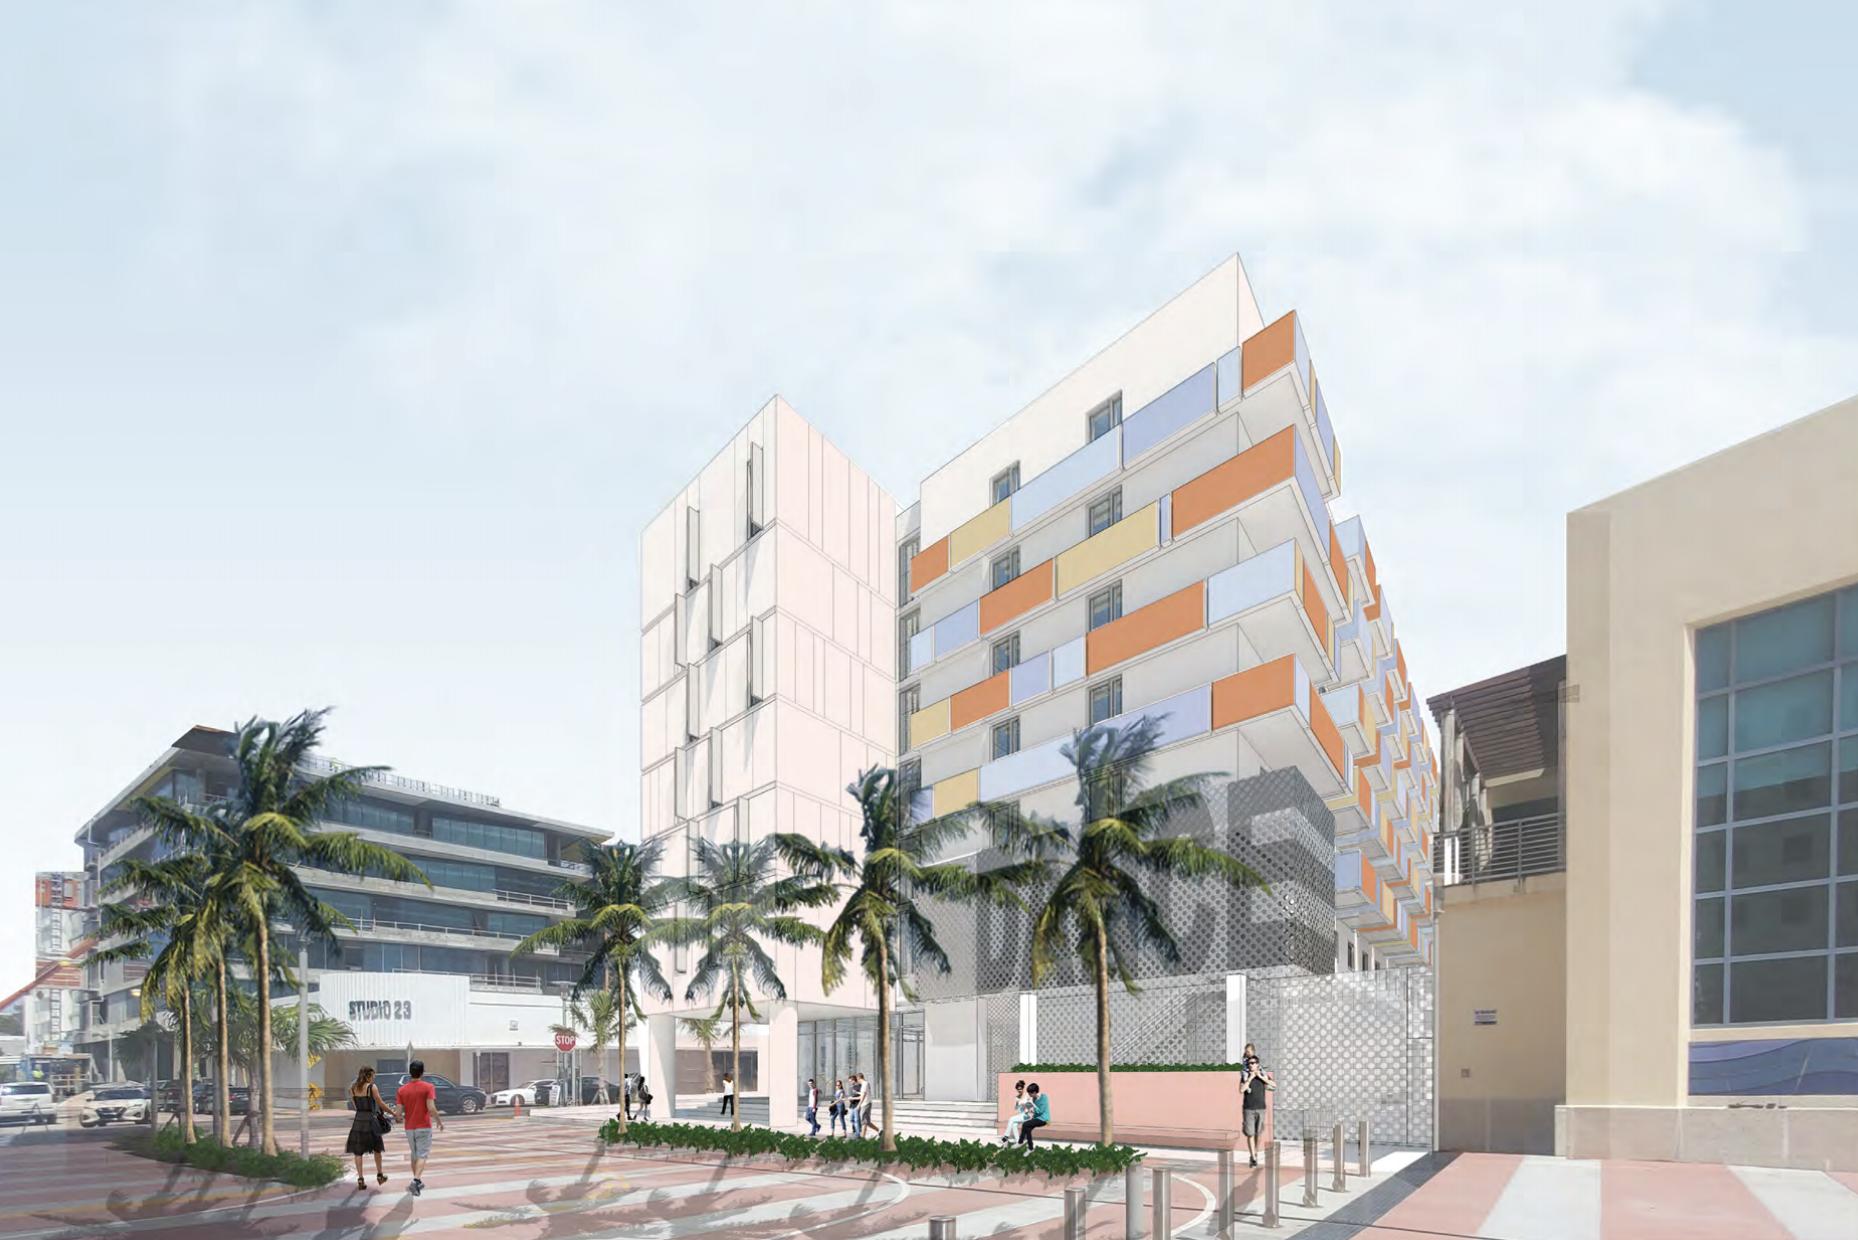 Collins Park Artist Workforce Housing. Designed by Shulman + Associates.